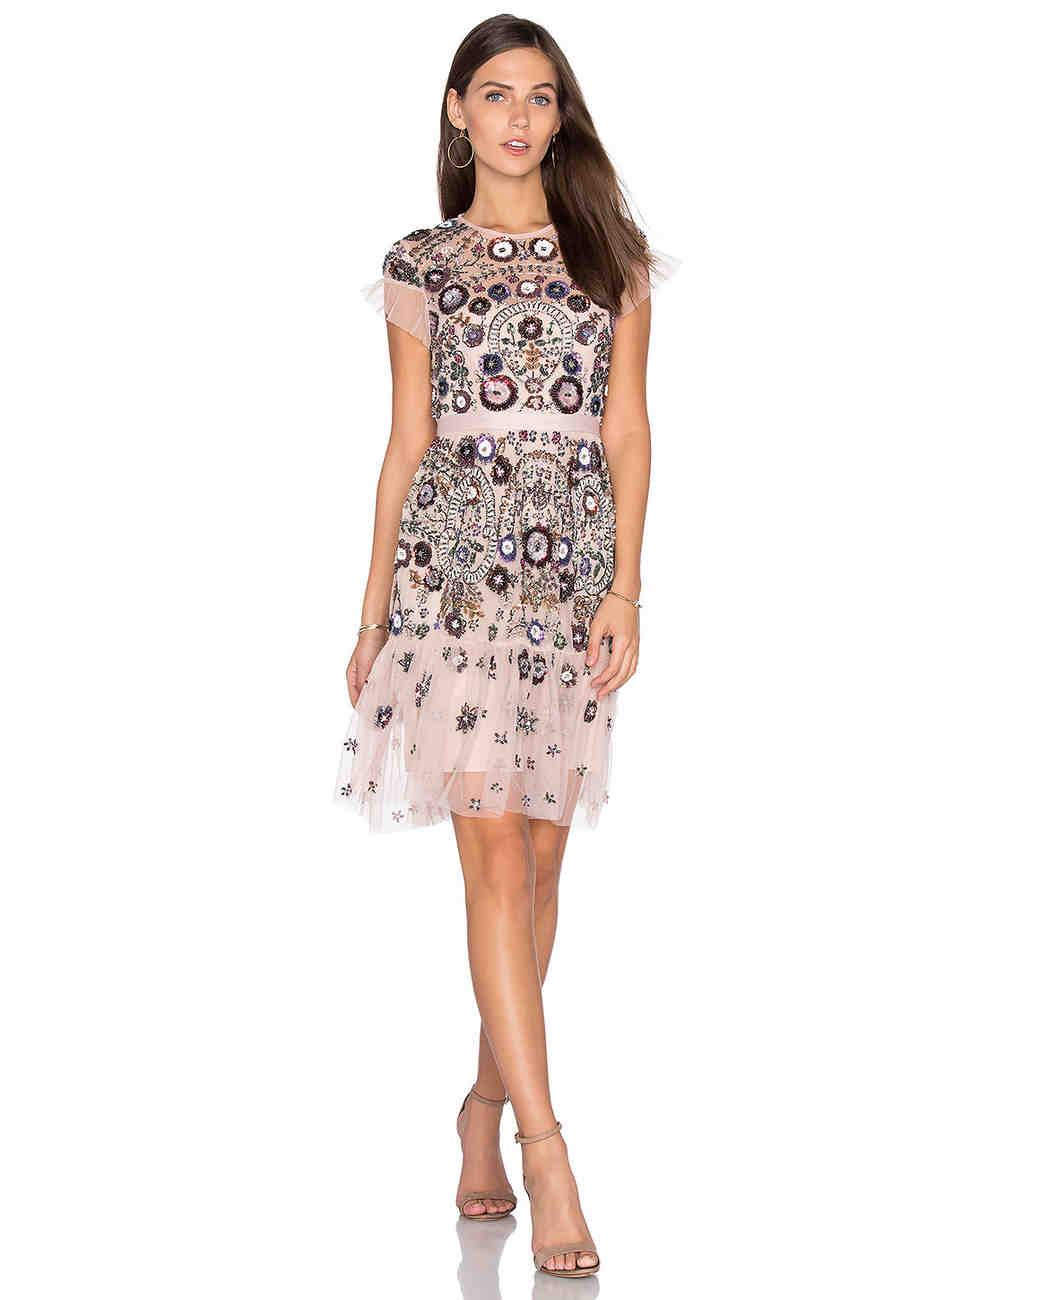 engagement party dress needle thread embellished lace